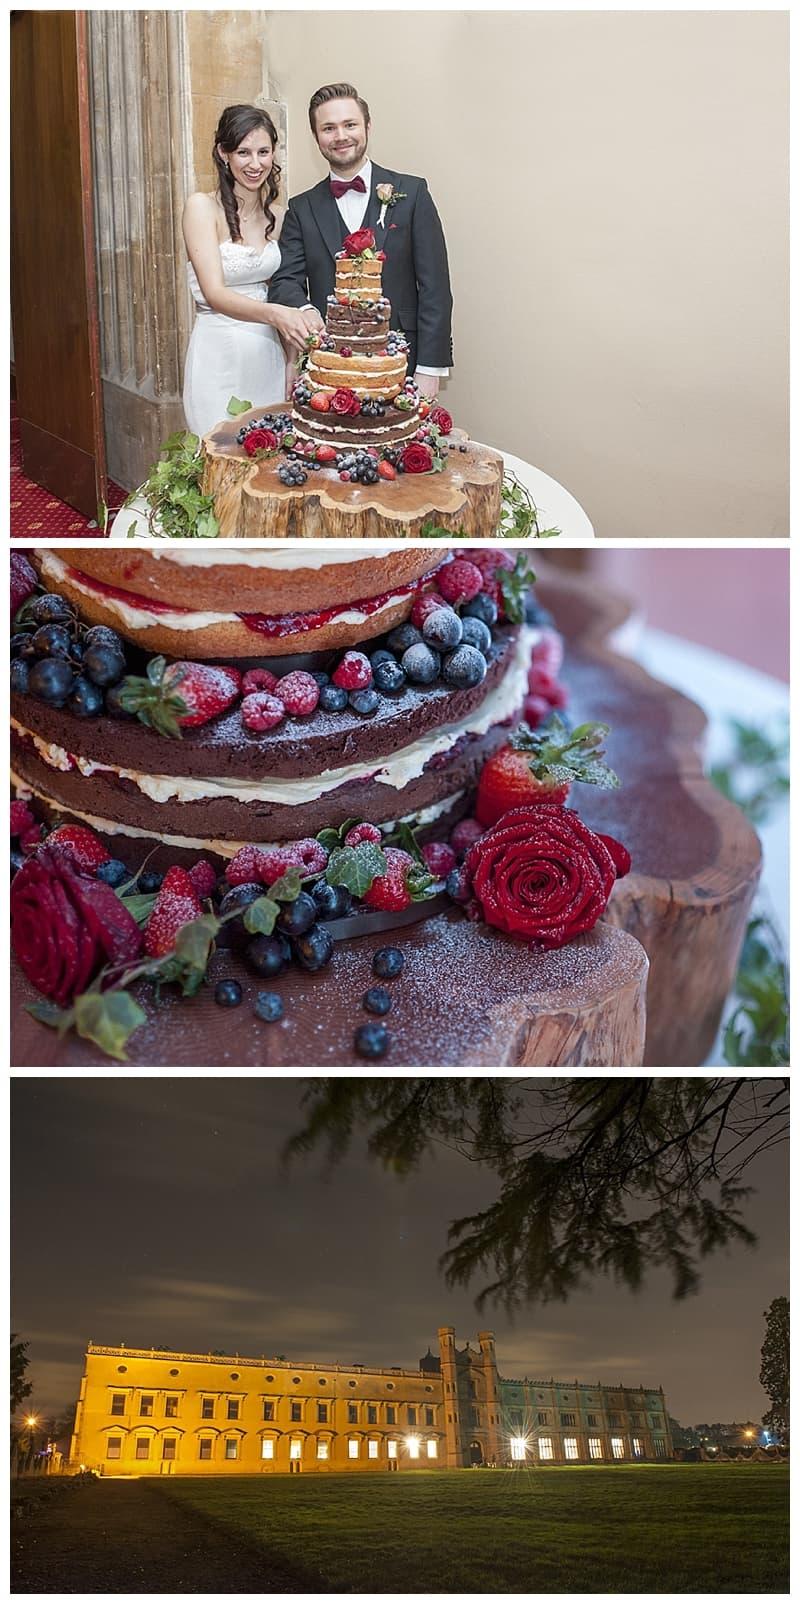 Ashton Court Estate Wedding, Leon & Anna, Clifton Bridge Wedding - Benjamin Wetherall Photography ©0080